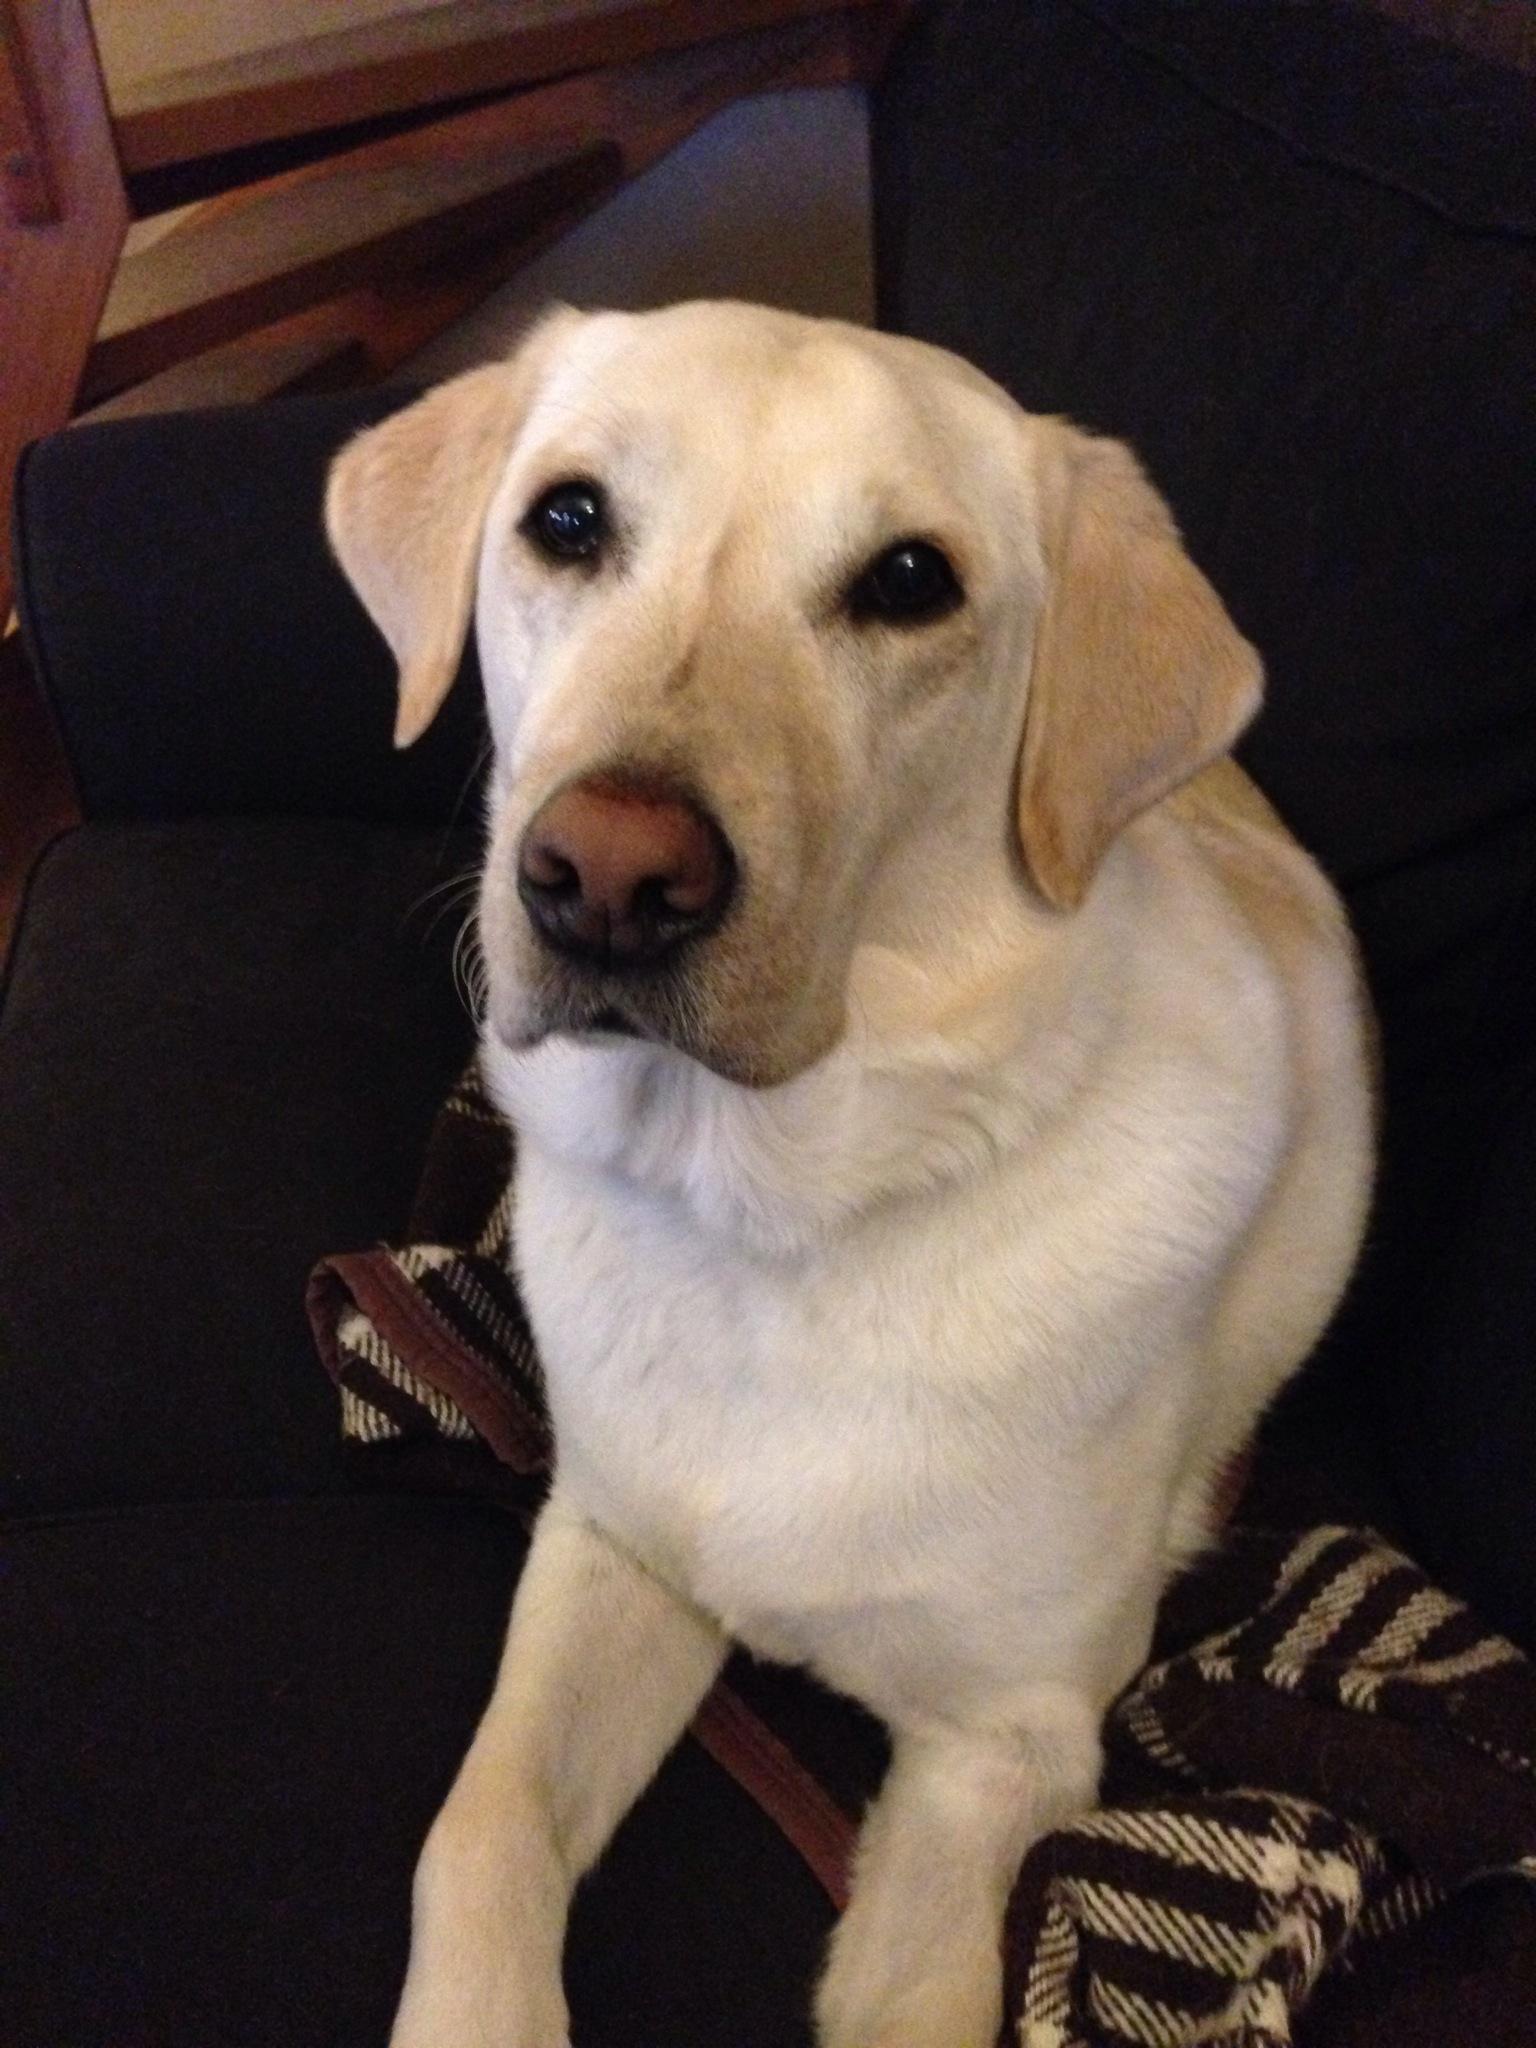 Bild: Ledarhunden Flinga ligger i en soffa